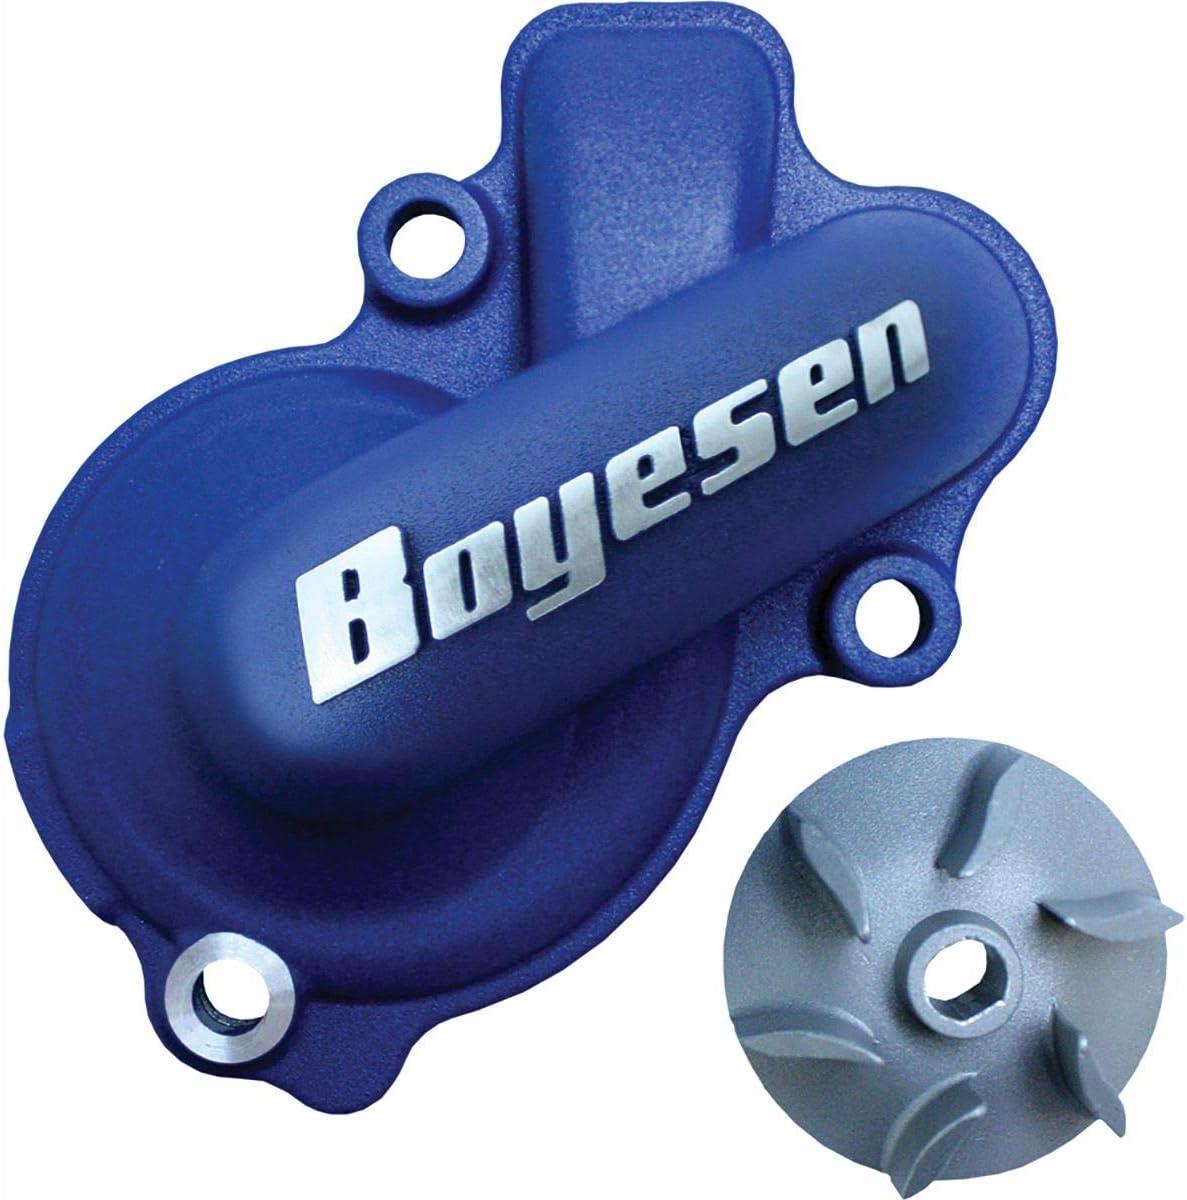 Boyesen WPK-31AL Blue Supercooler Water Pump Cover and Impeller Kit